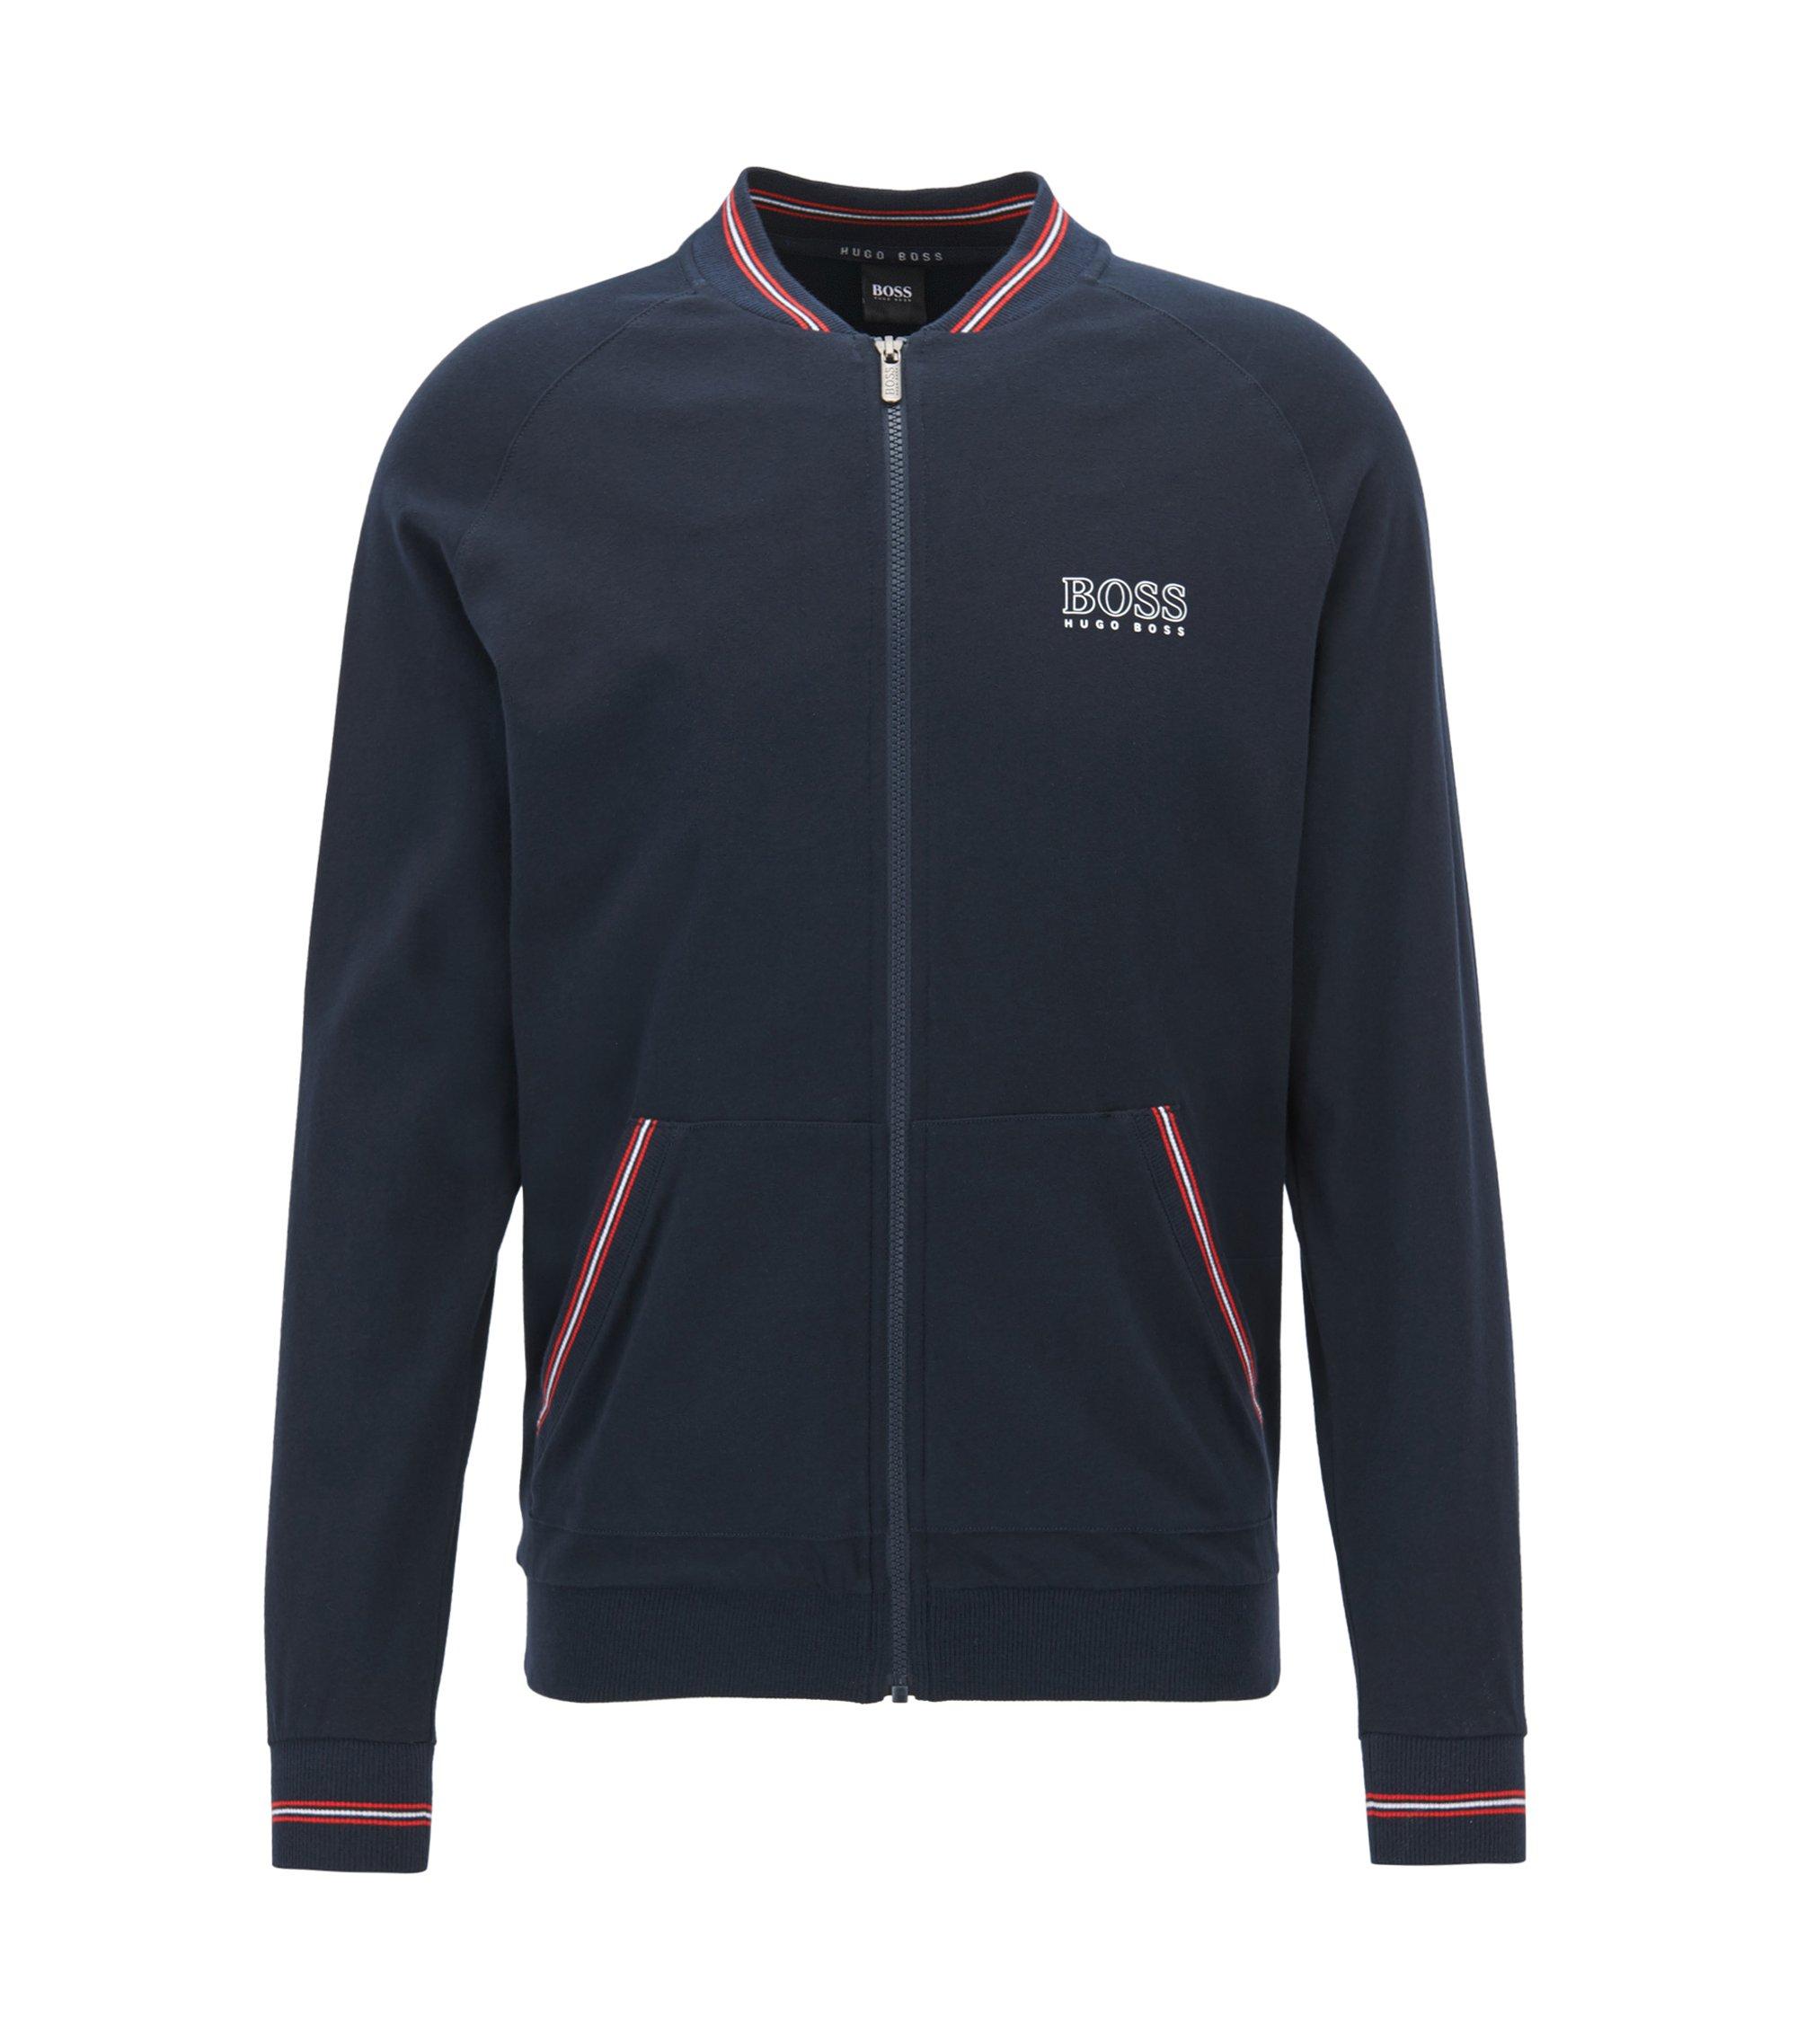 Cotton Jersey Full-Zip Jacket | Authentic Jacket H, Dark Blue